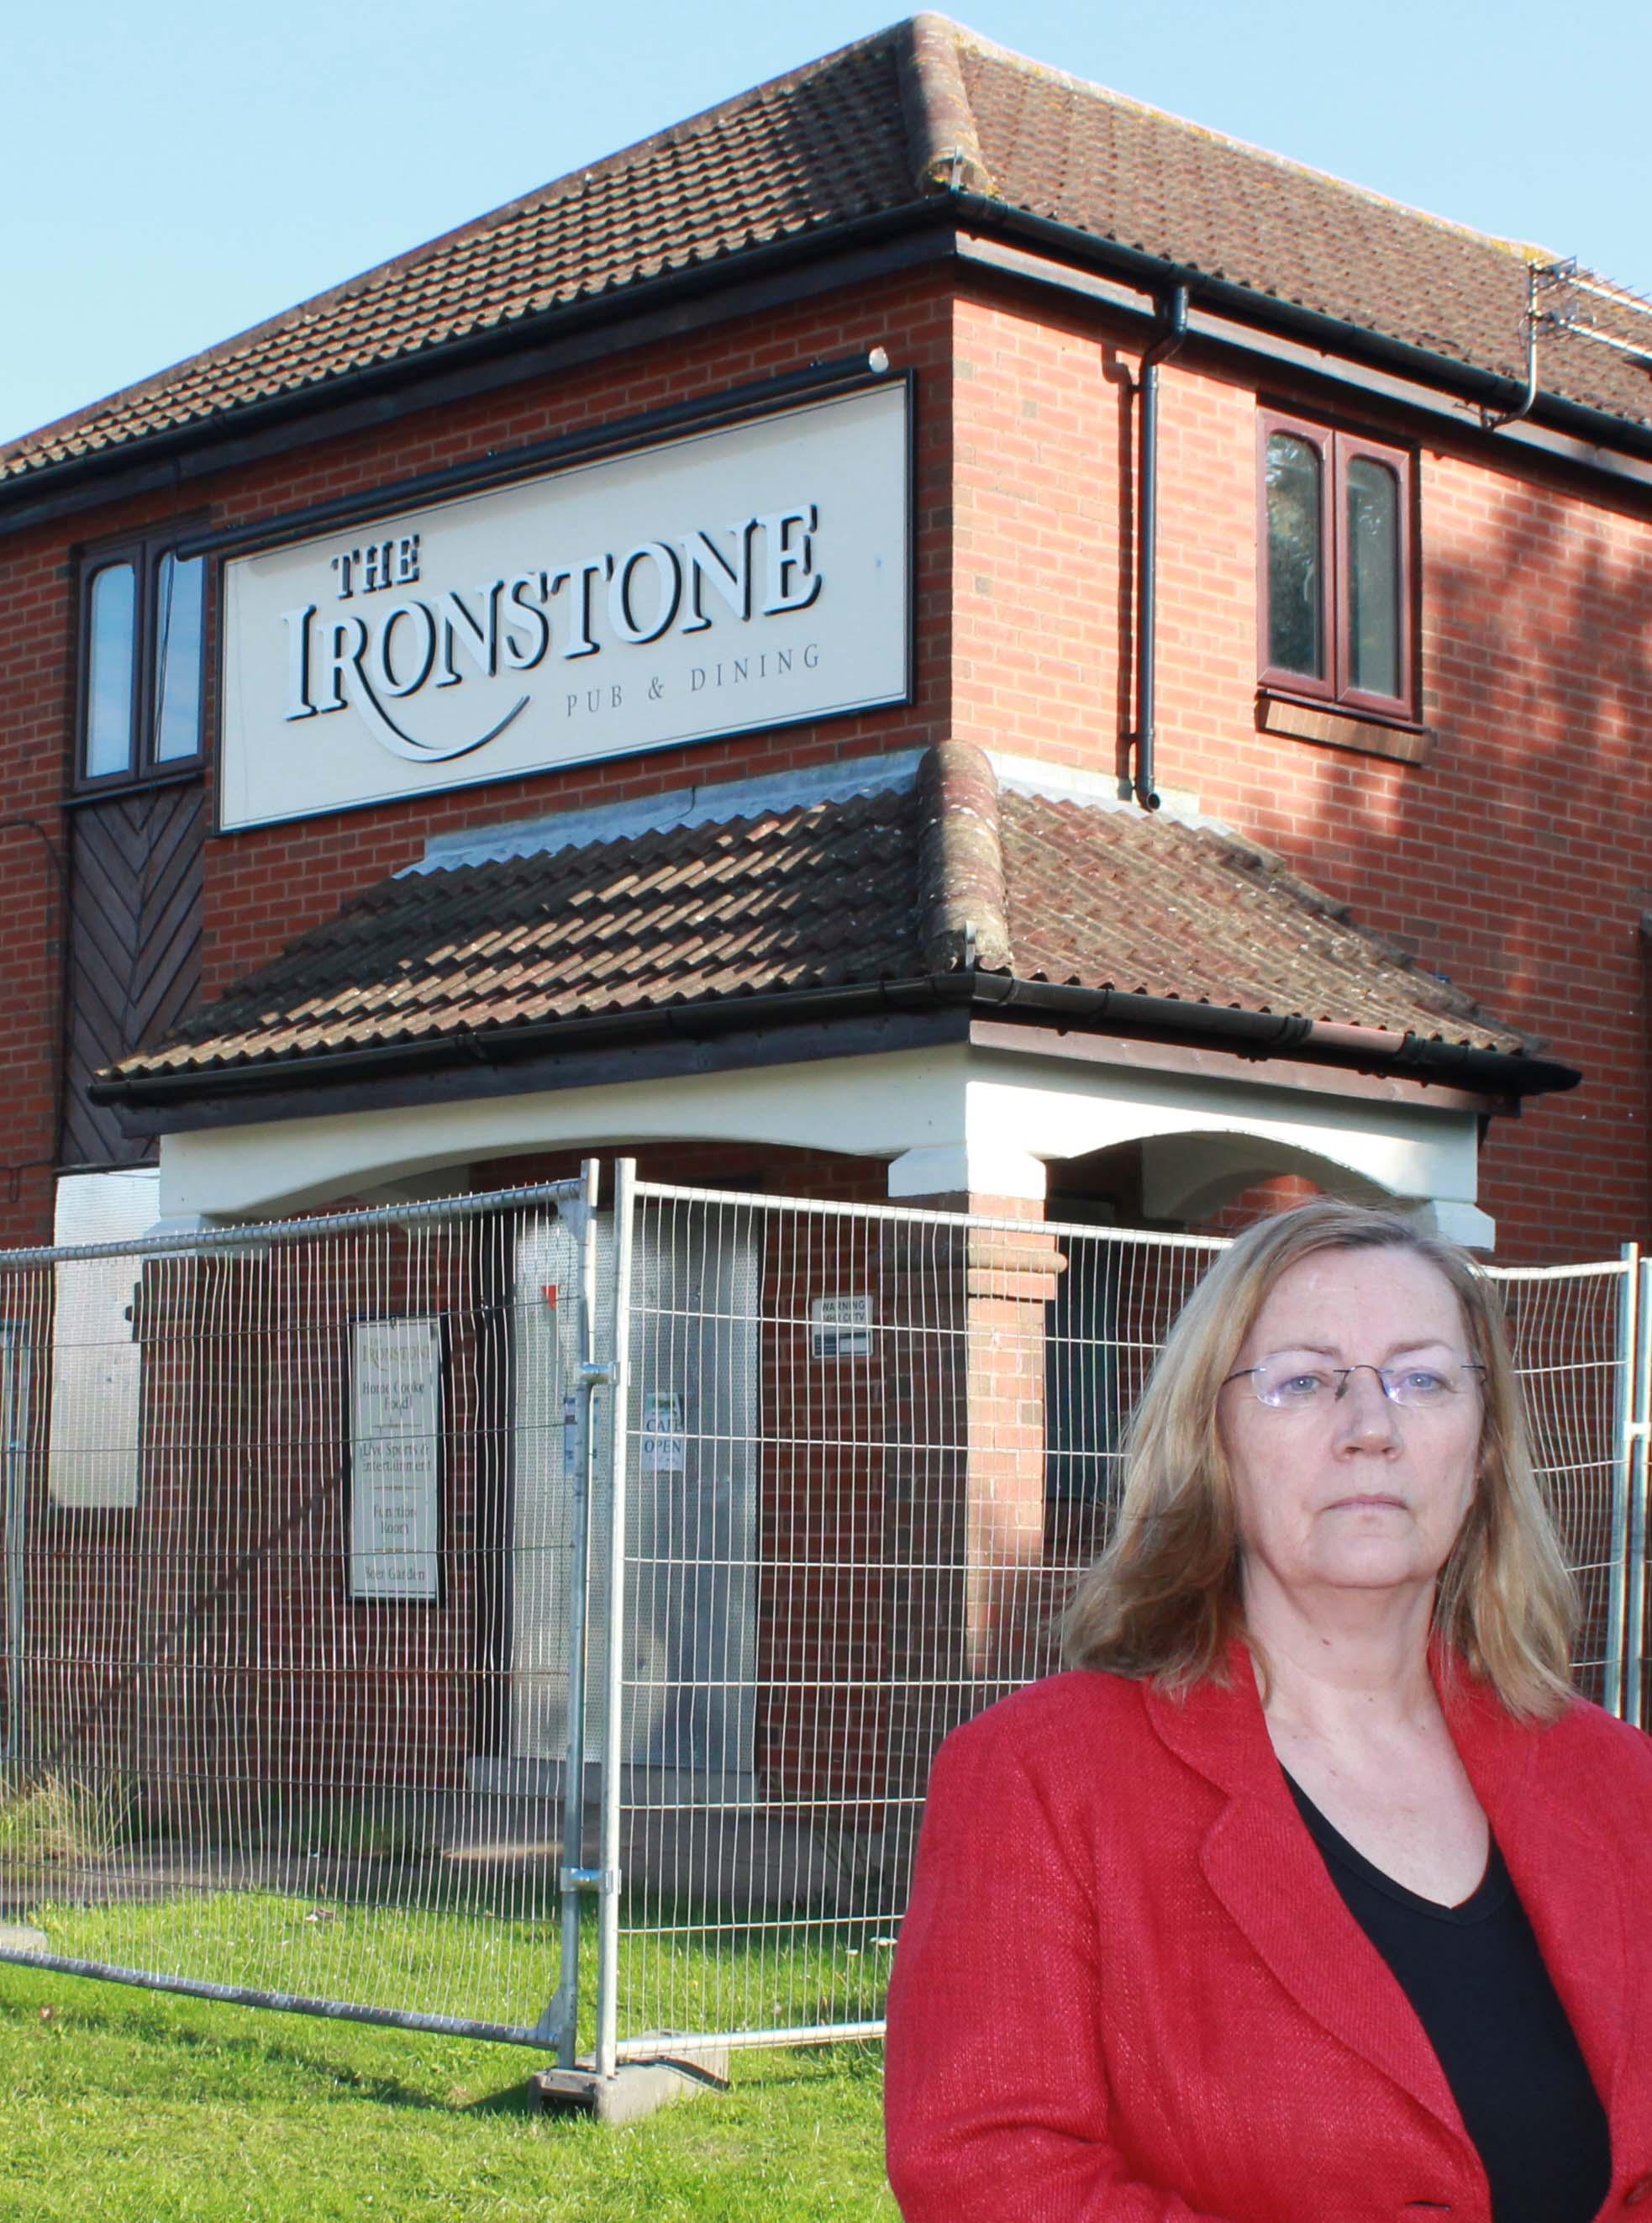 The Ironstone